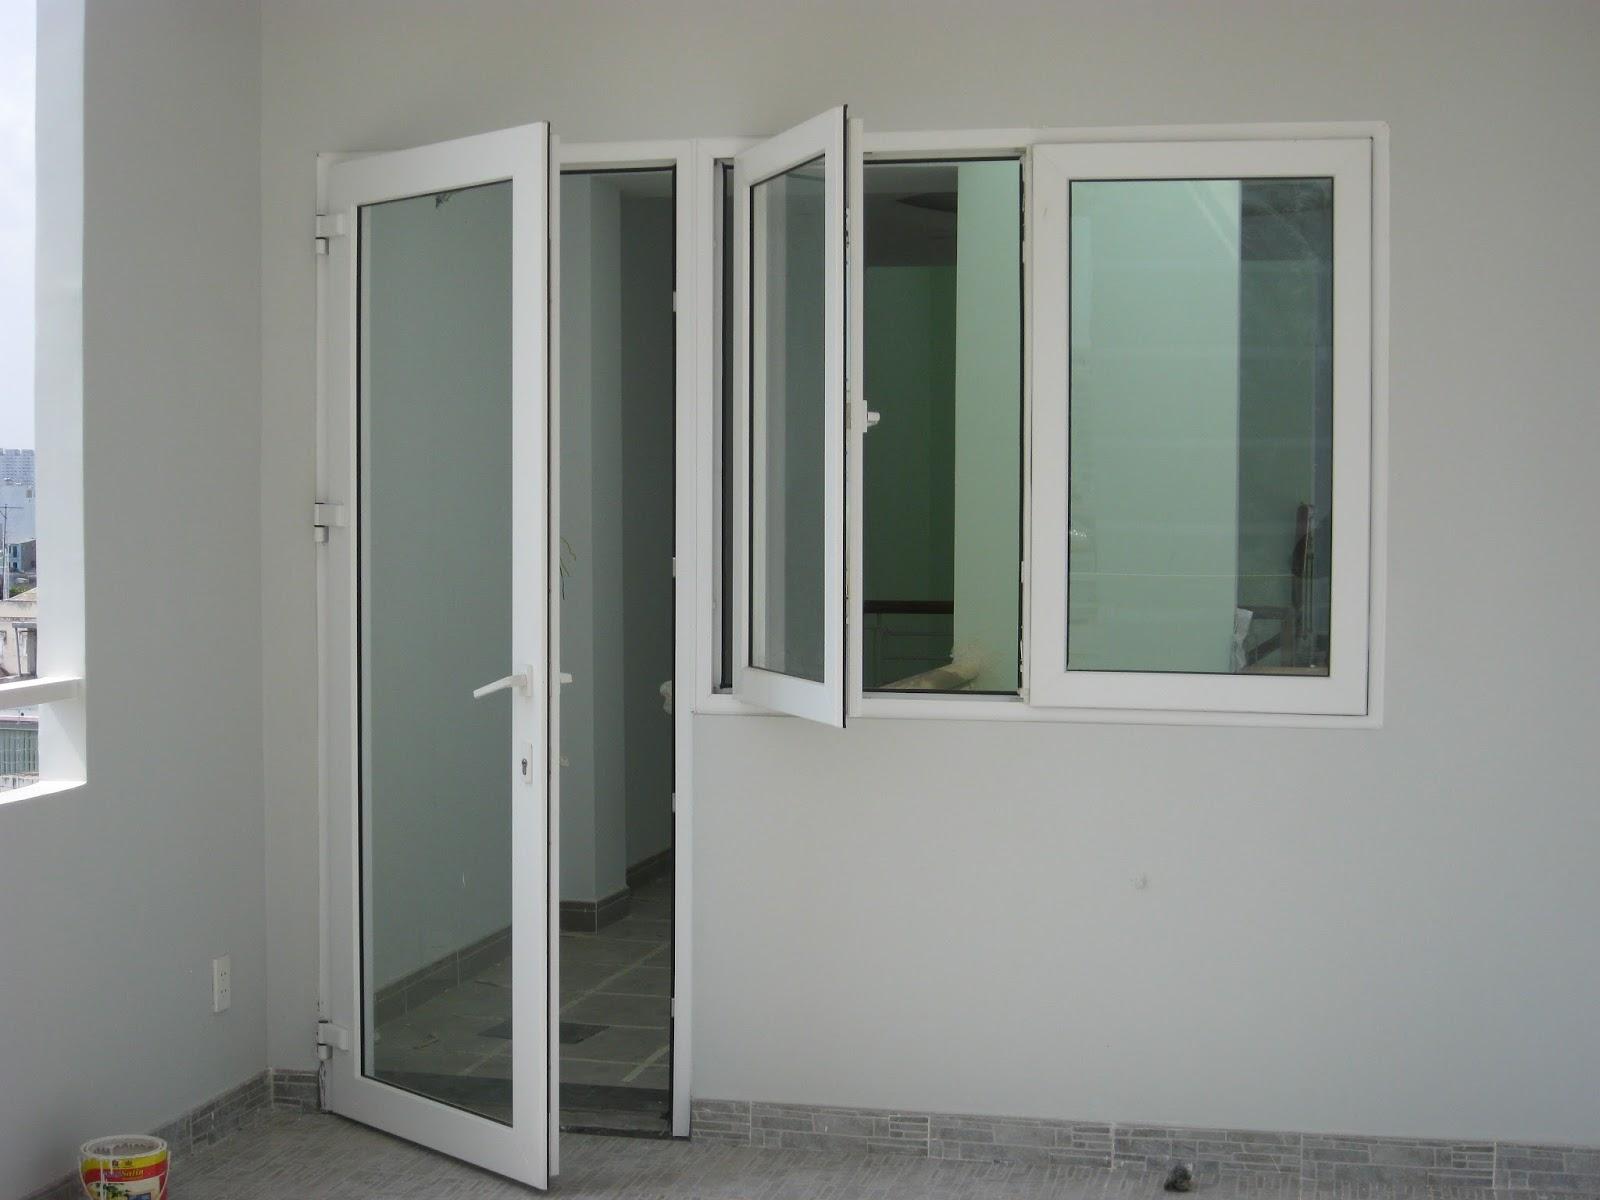 Cửa nhựa lỏi thép MV-15